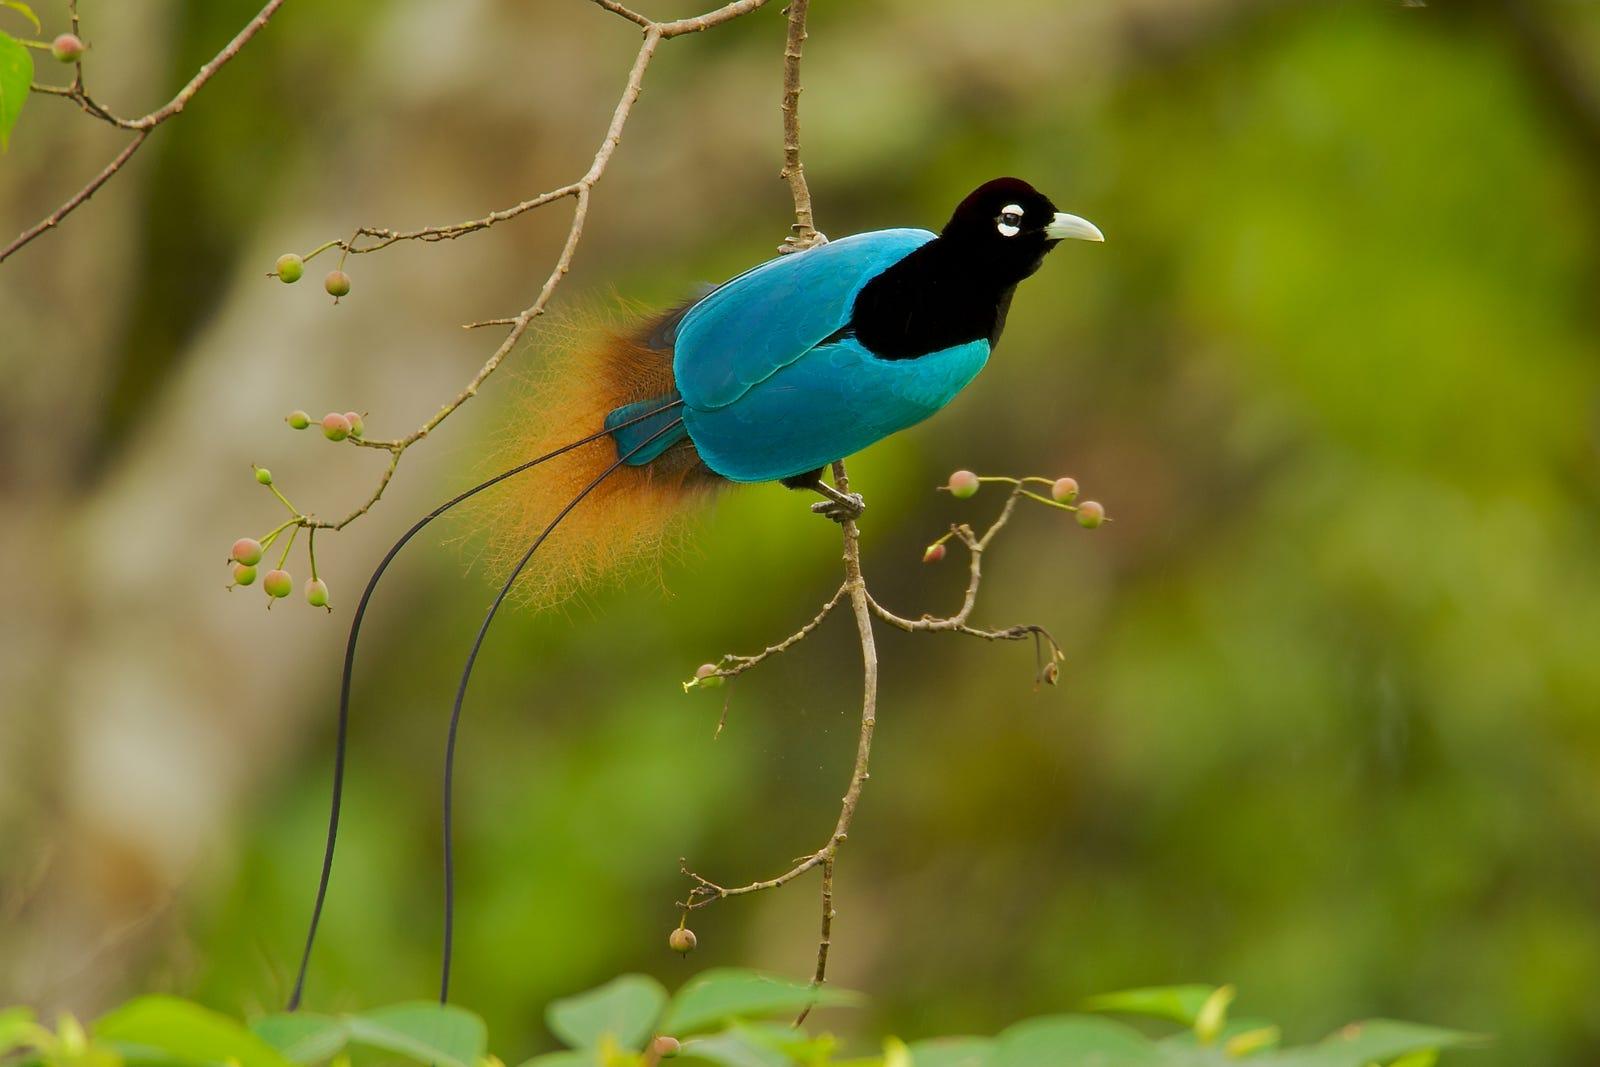 The blue bird-of-paradise.